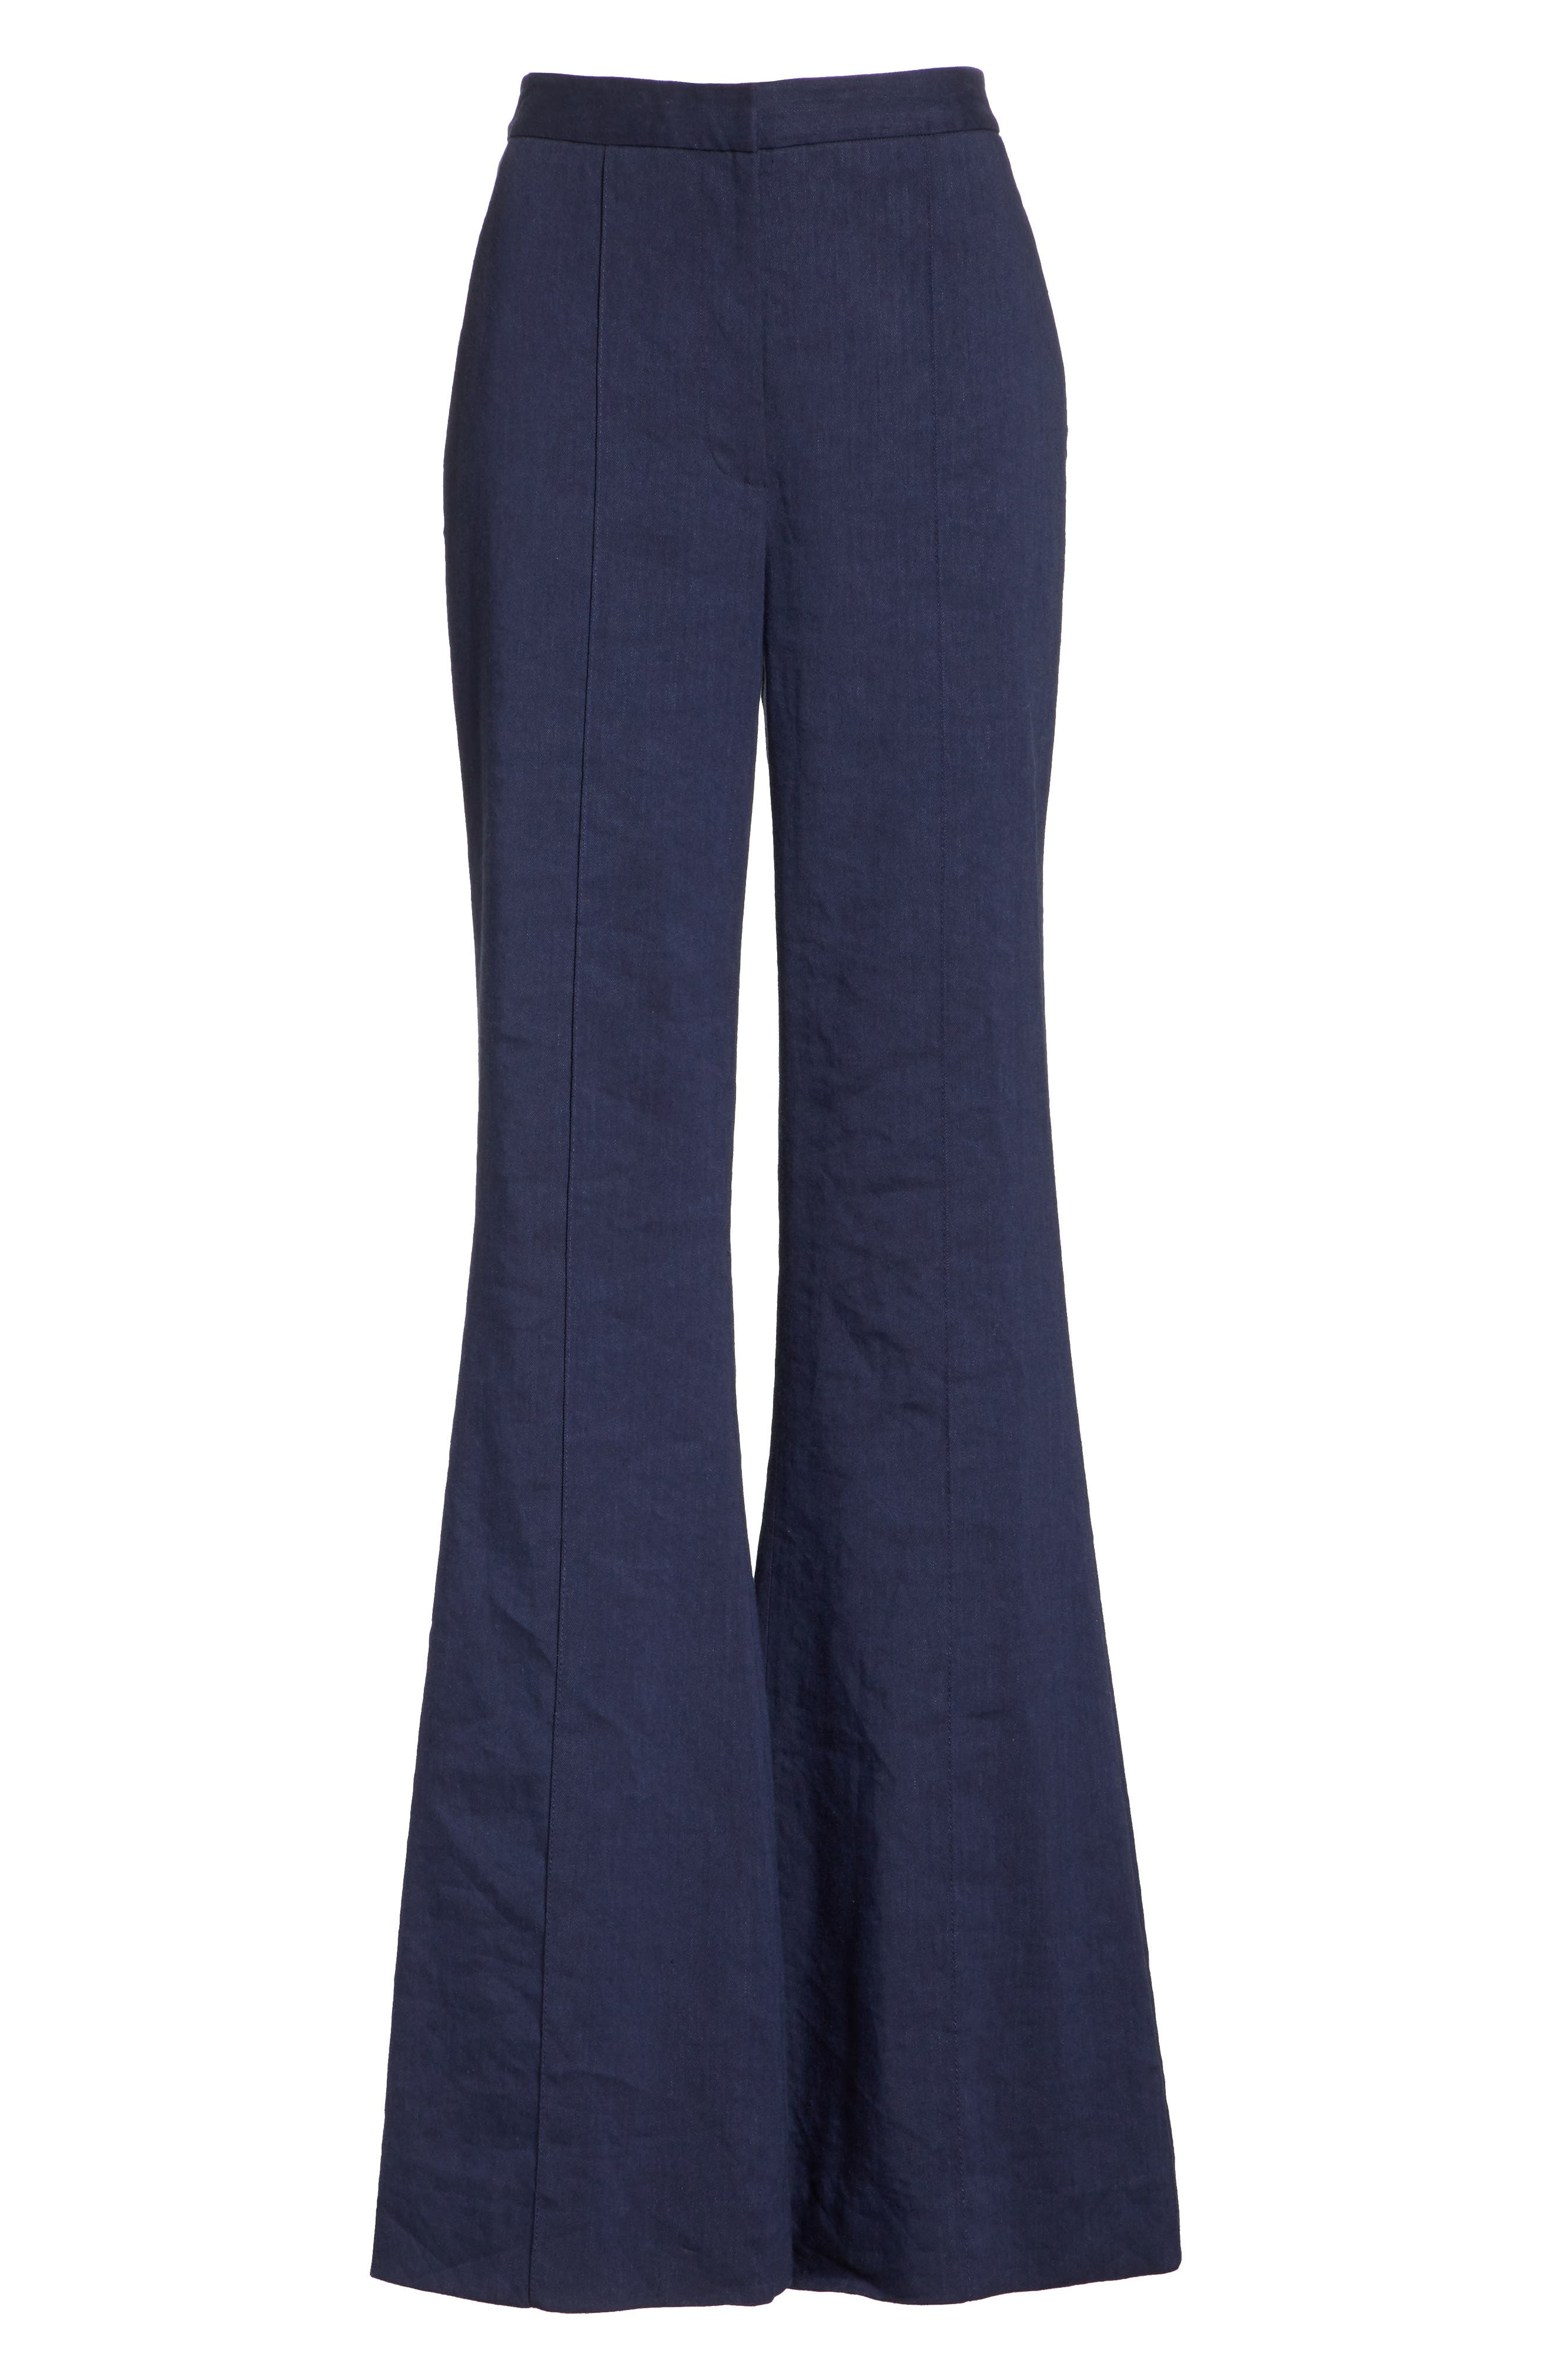 Diane von Furstenberg Pleat Front Flare Stretch Linen Blend Pants,                             Alternate thumbnail 6, color,                             New Navy